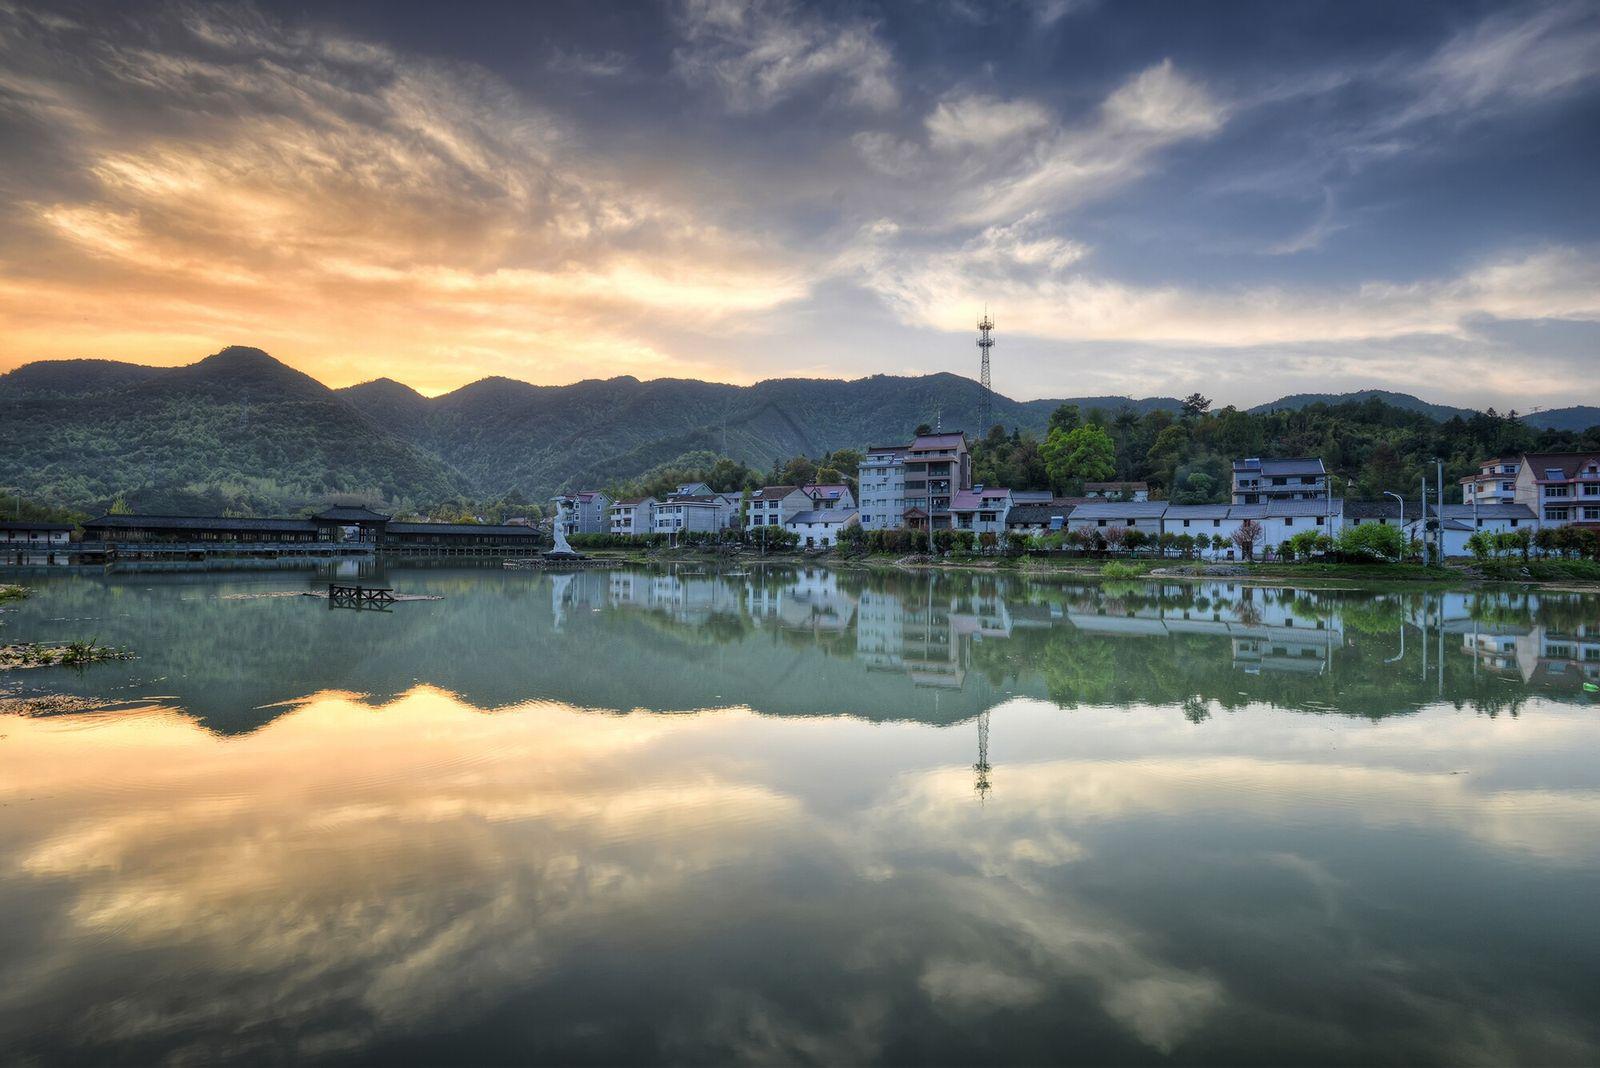 Tonglu, China | A pitoresca zona rural de Tonglu inspira artistas e escritores chineses há séculos, ...